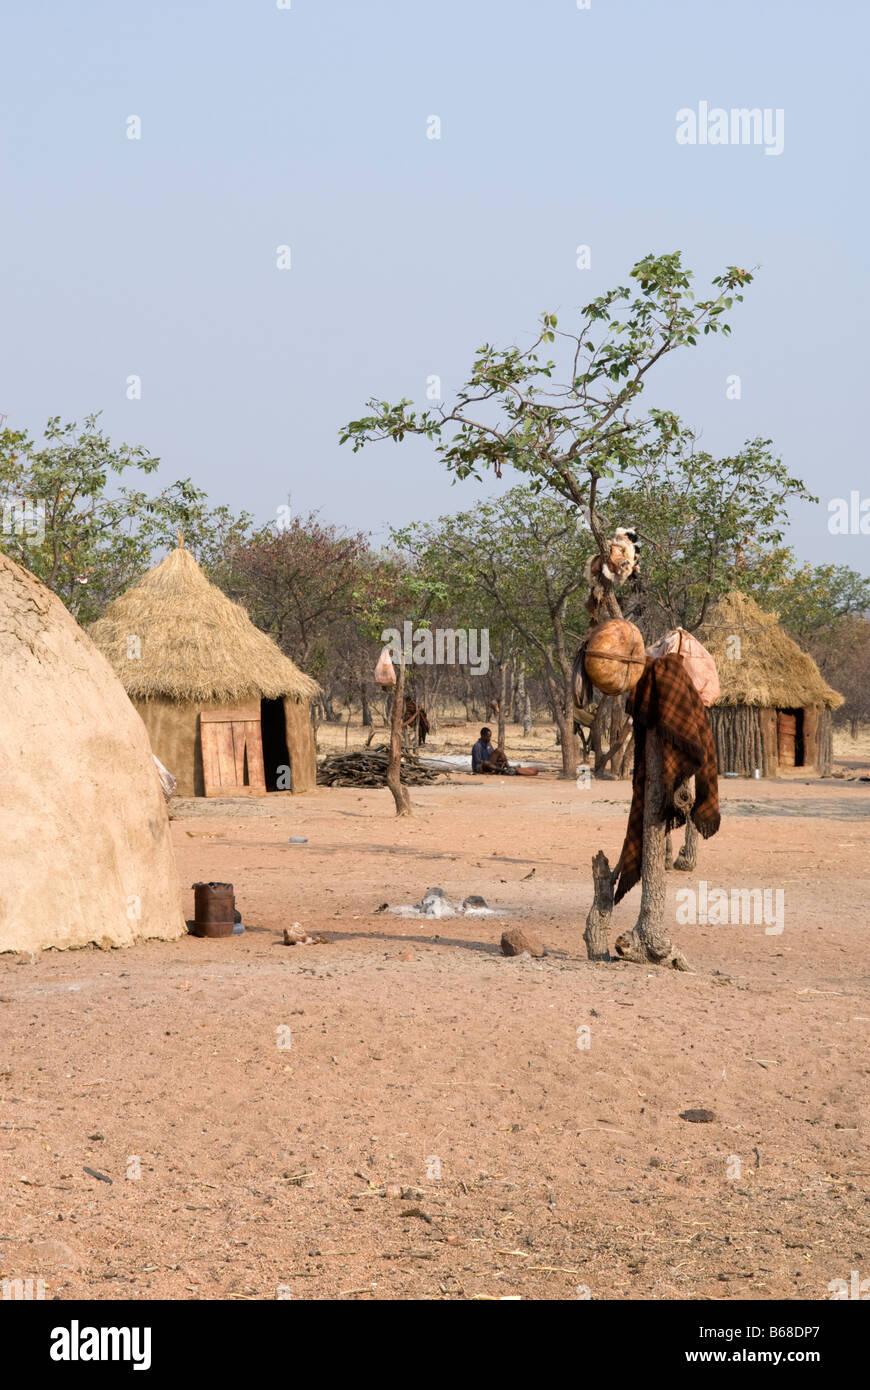 Traditional village huts built from mud and dung at the Himba Oase Village, near Kamanjab, Namibia - Stock Image